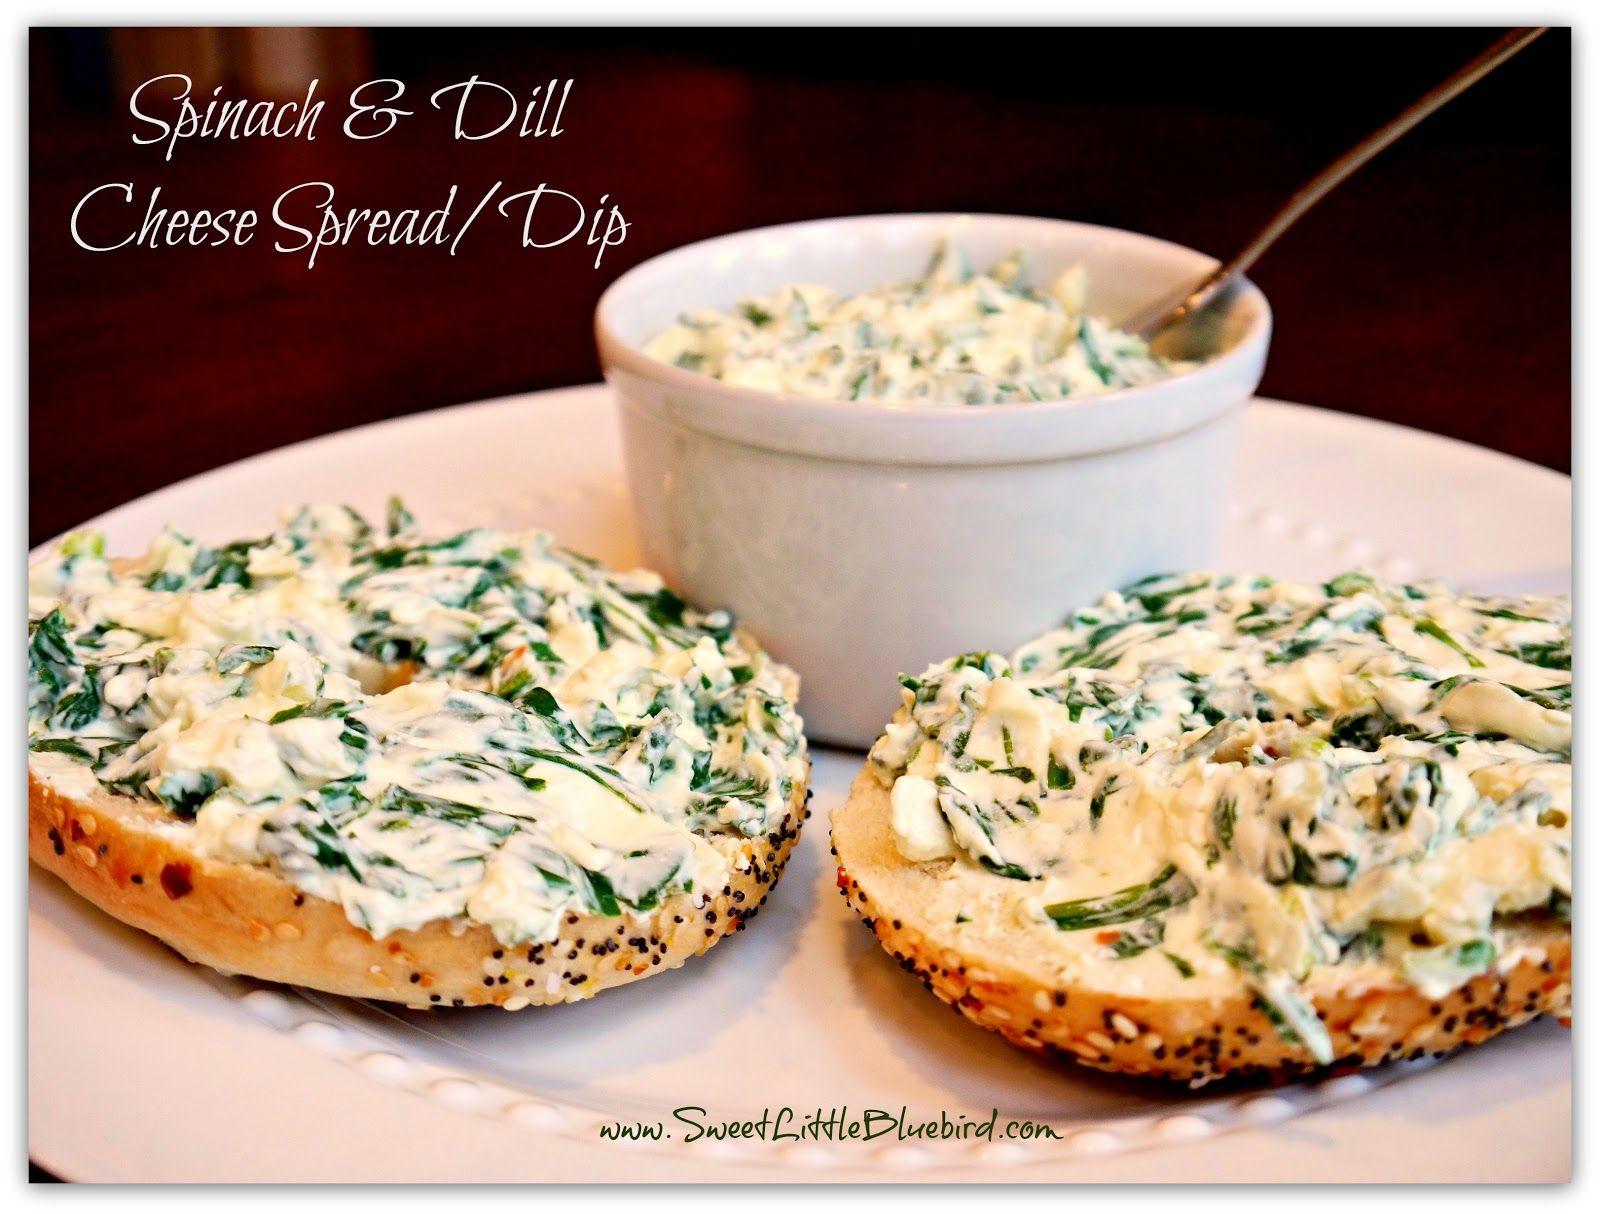 Spinach and Dill Cheese Spread (Spinach, Cream Cheese, Feta, Lemon, Dill, Green Onion, Garlic)